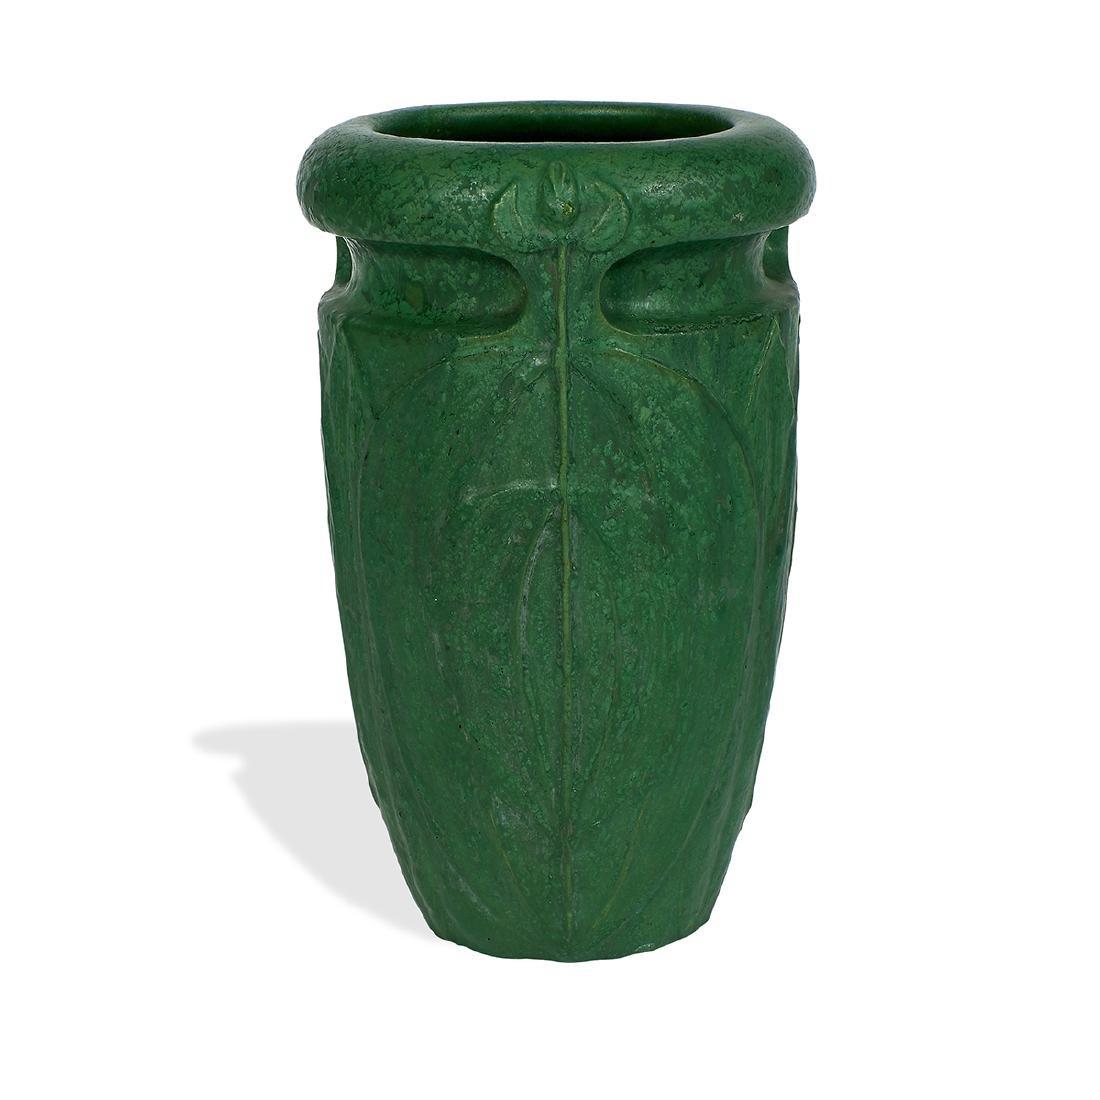 Wheatley Pottery Company, Stylized Foliate Vase